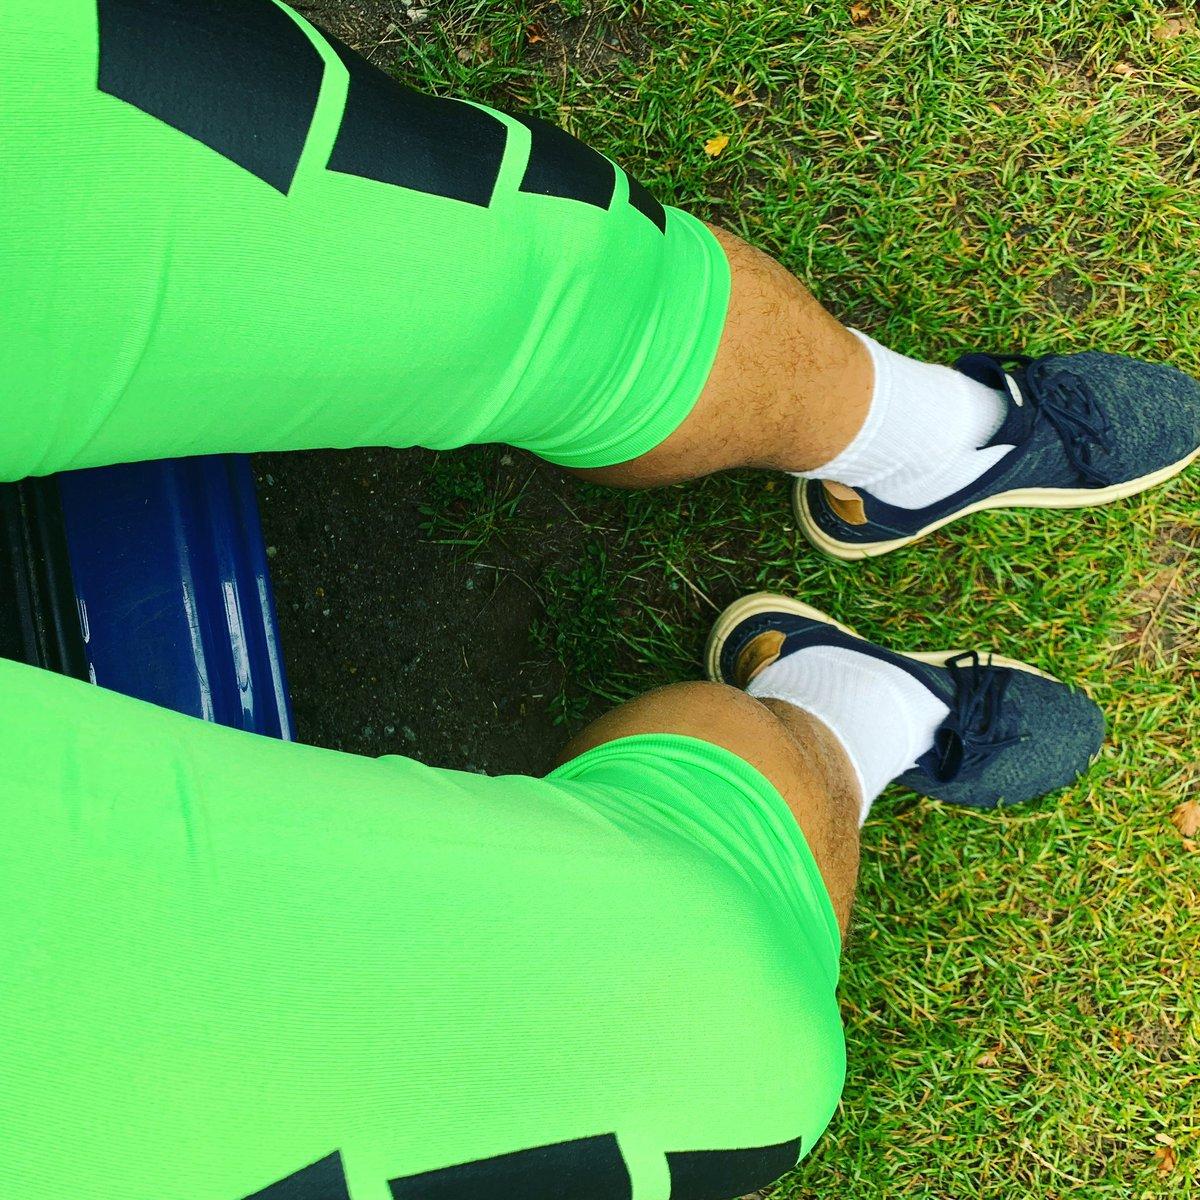 Ready,steady and go. #fit #fitness #fitguy #lifestyleblogger #lifestyleblogger #workout #myshake #healthylifestyle #healthyliving #gymshark #fitnessmotivation #weightloss  #covid19fitnesscrazy #whitesocks #greenlegsupportpic.twitter.com/3TkSXKM9Q0